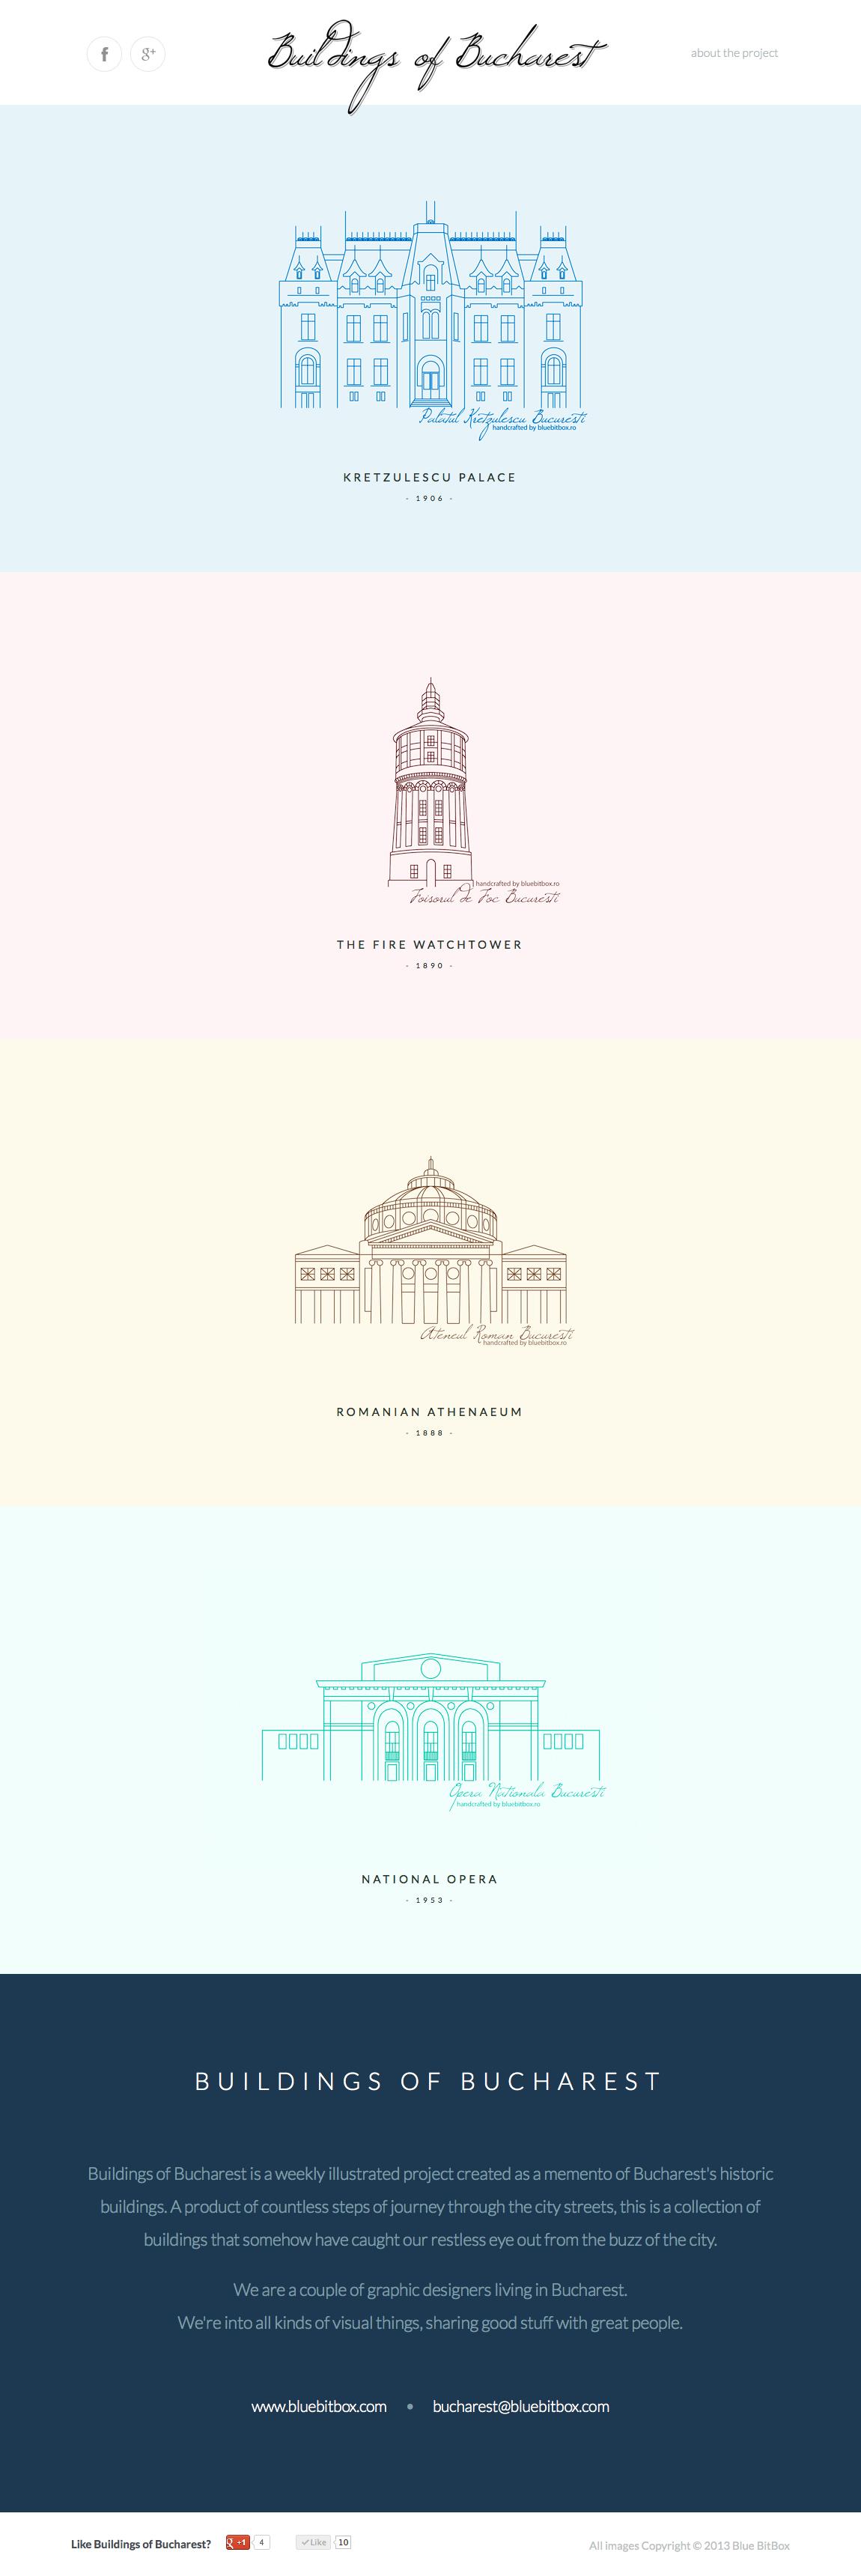 Buildings of Bucharest Website Screenshot